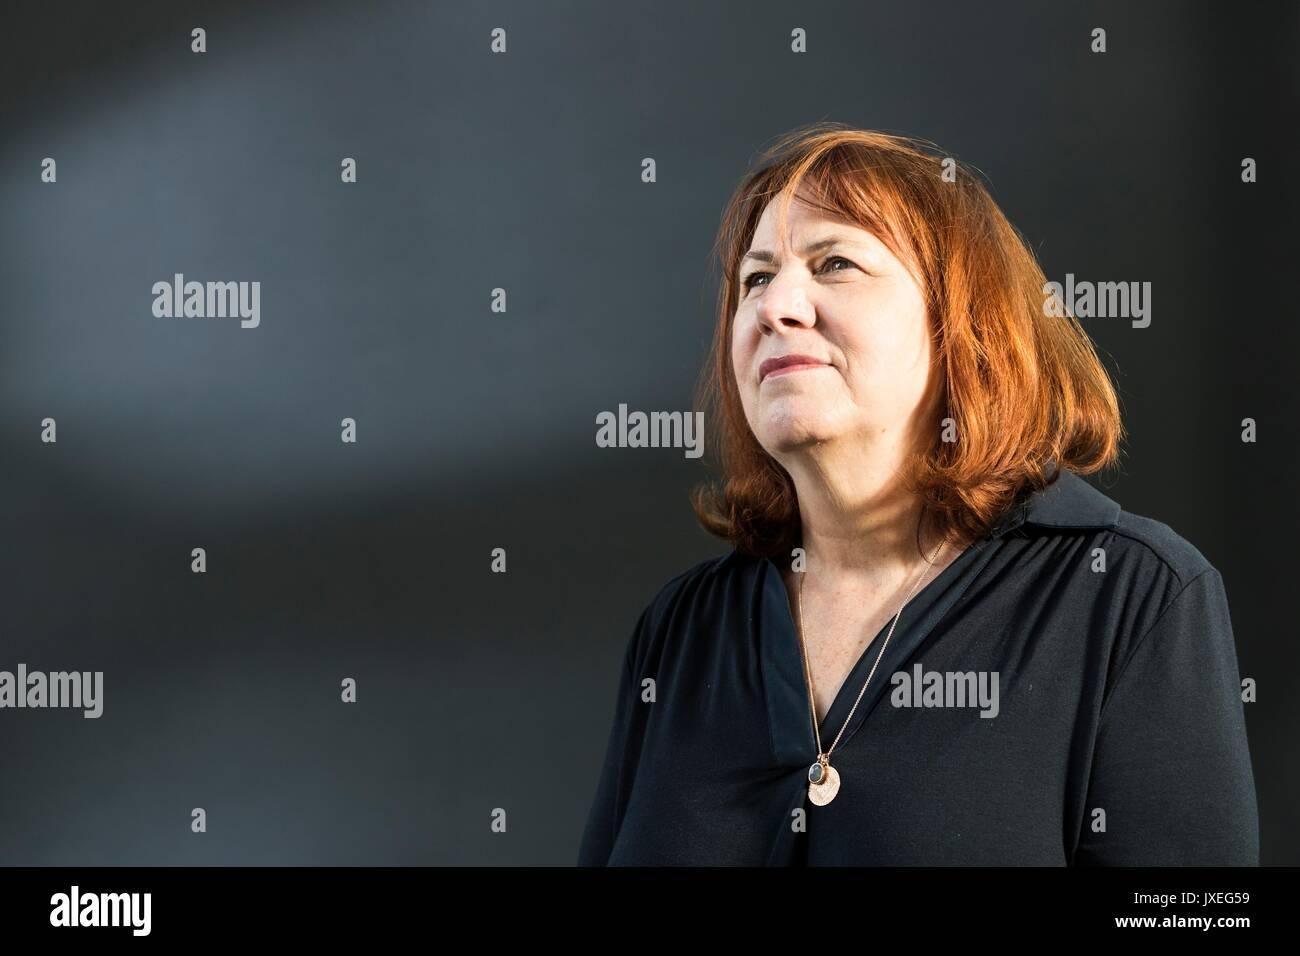 Edinburgh, UK. 16th Aug, 2017.  Linda Grant appearing at the Edinburgh International Book Festival Linda Grant is Stock Photo